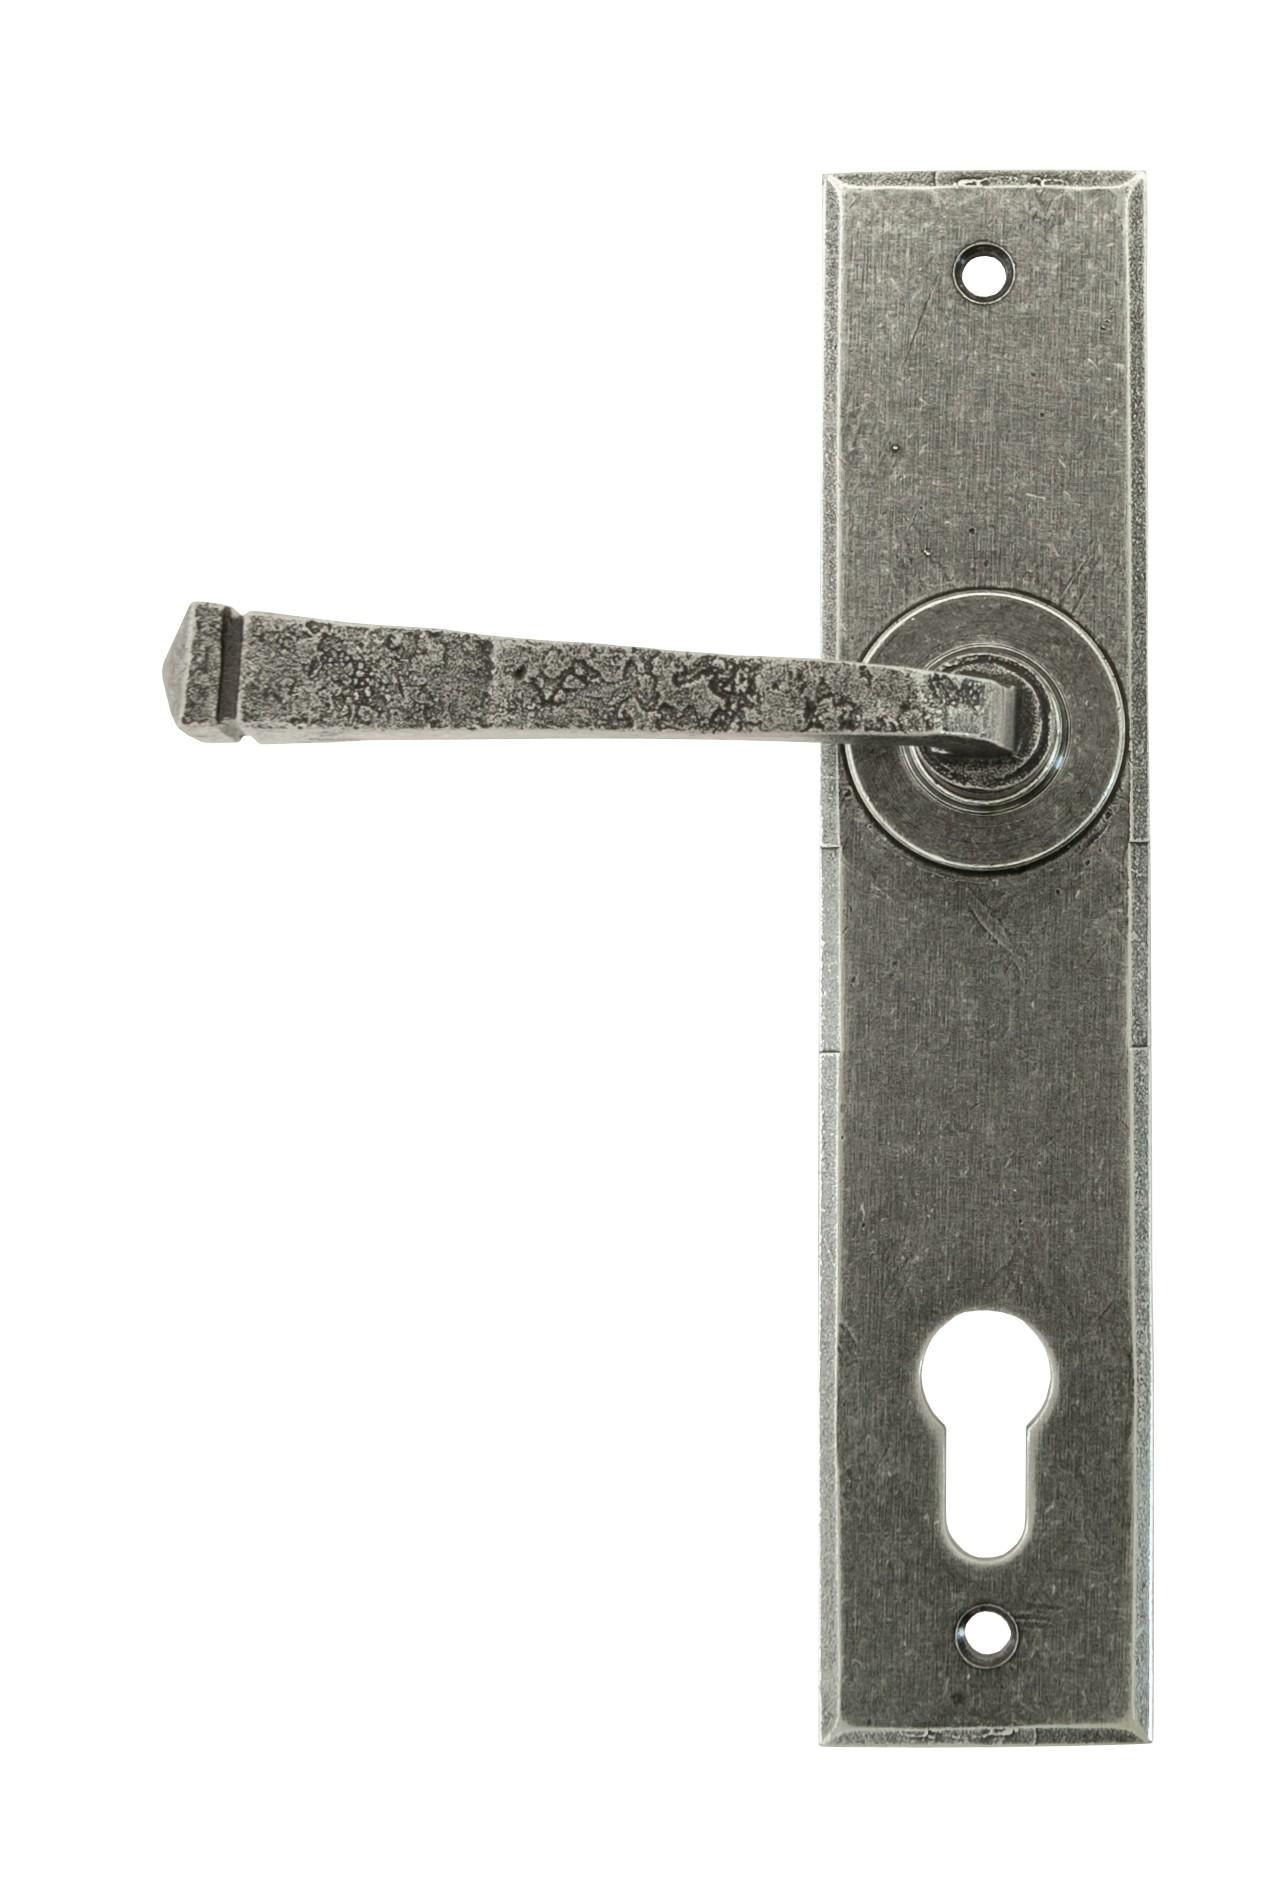 ANVIL - Pewter Avon Lever Espag. Lock Set